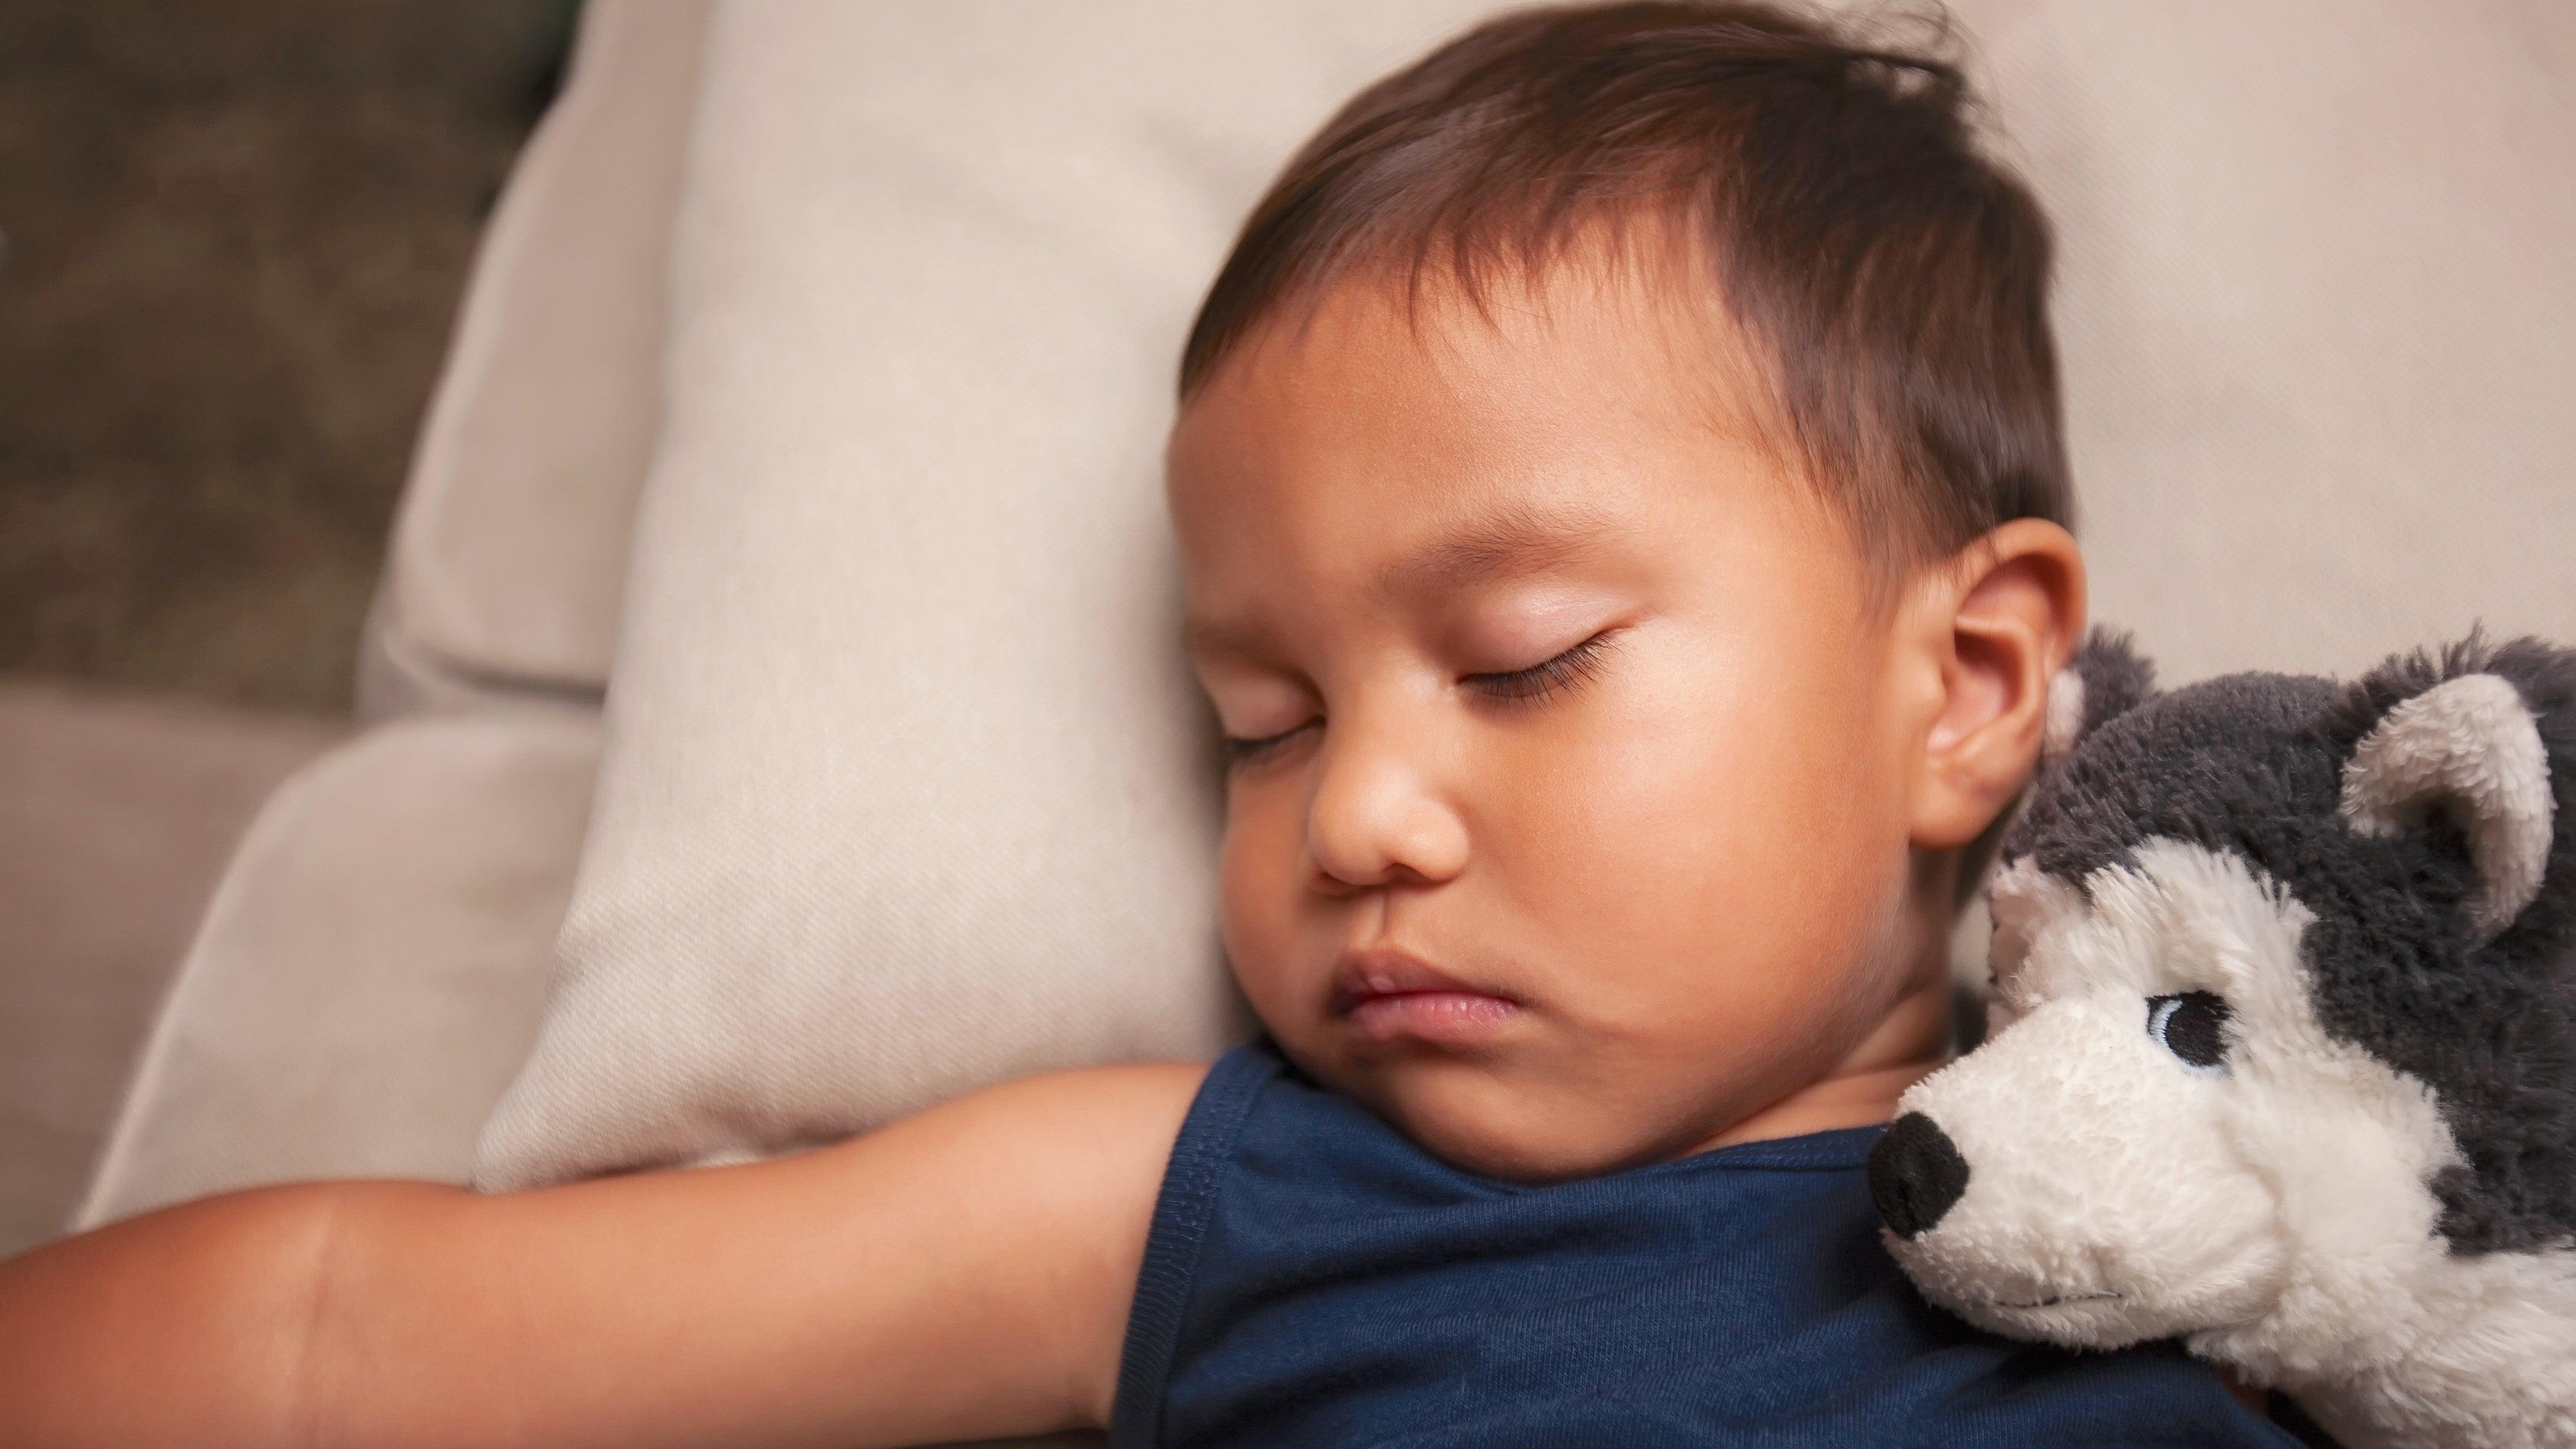 Sleep Train Your Toddler Using This Method By Harvey Karp